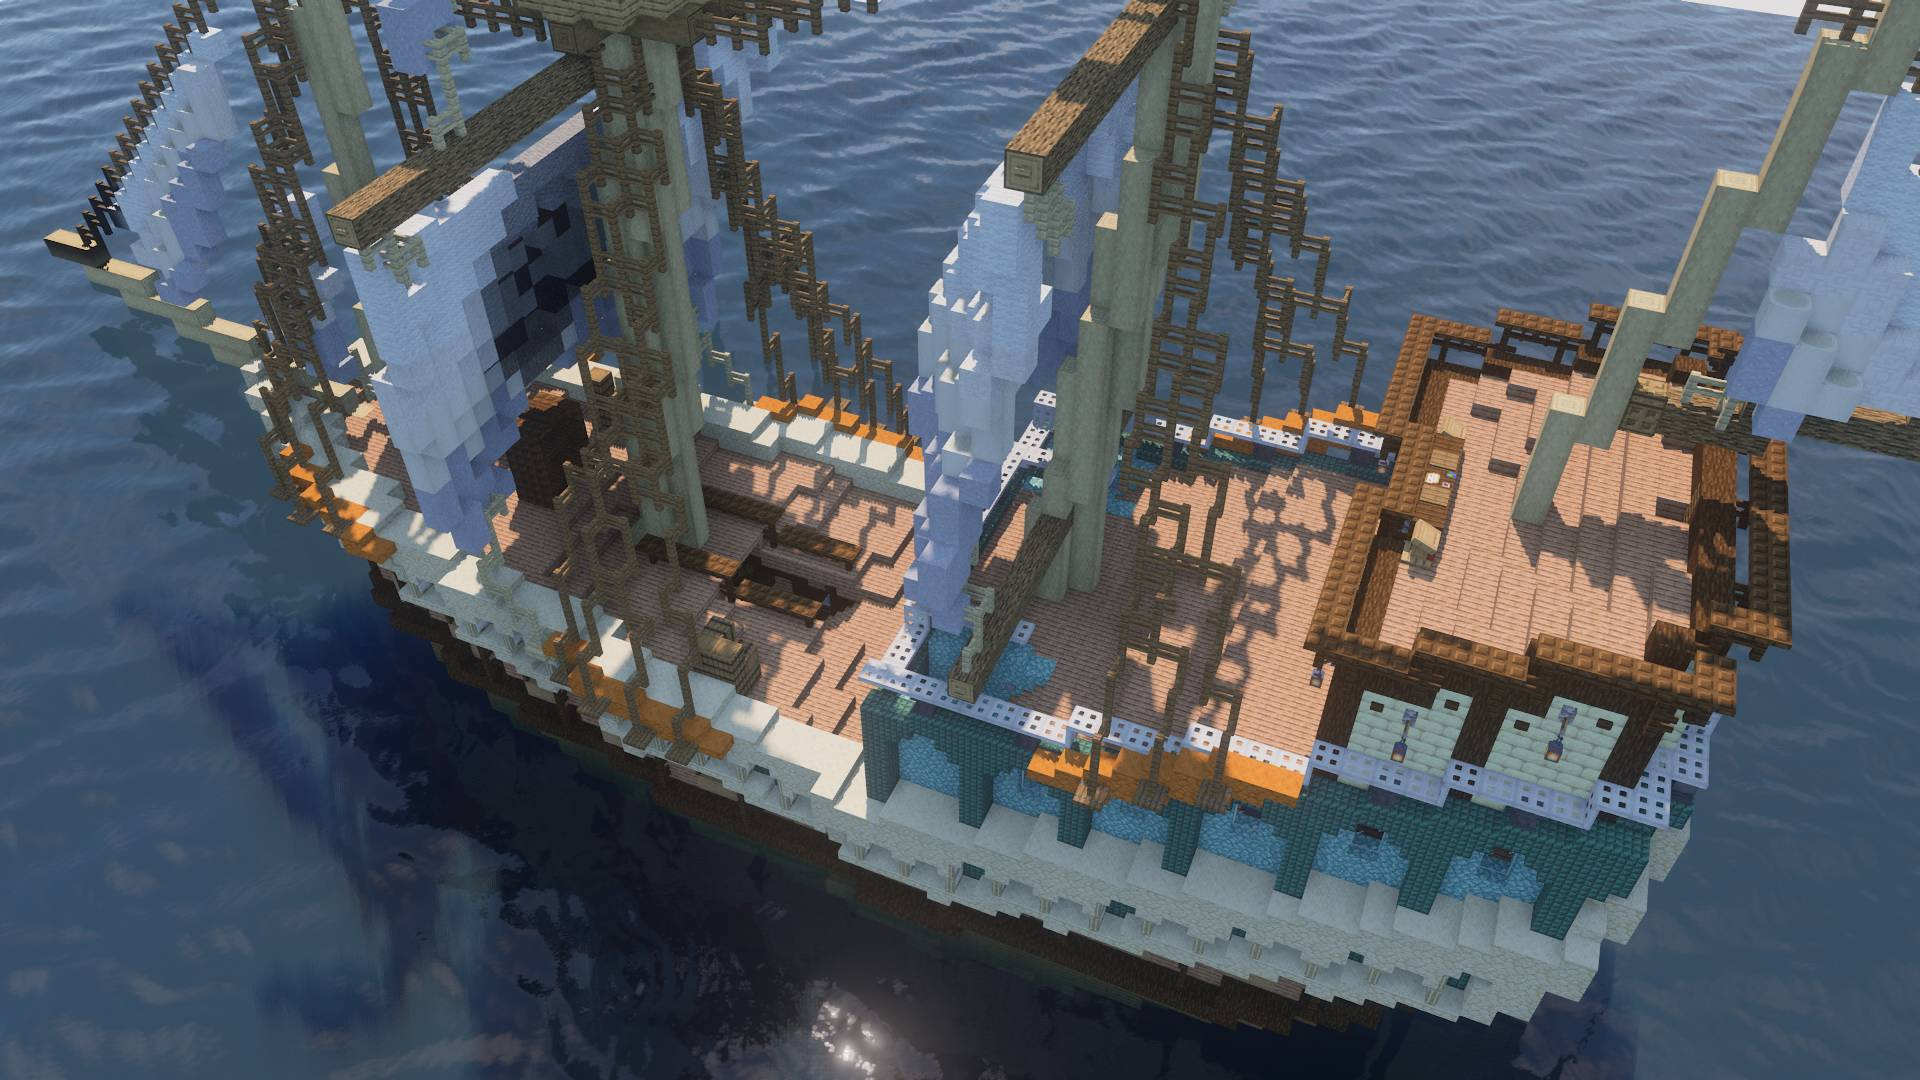 Hijacked Spanish Galleon 5